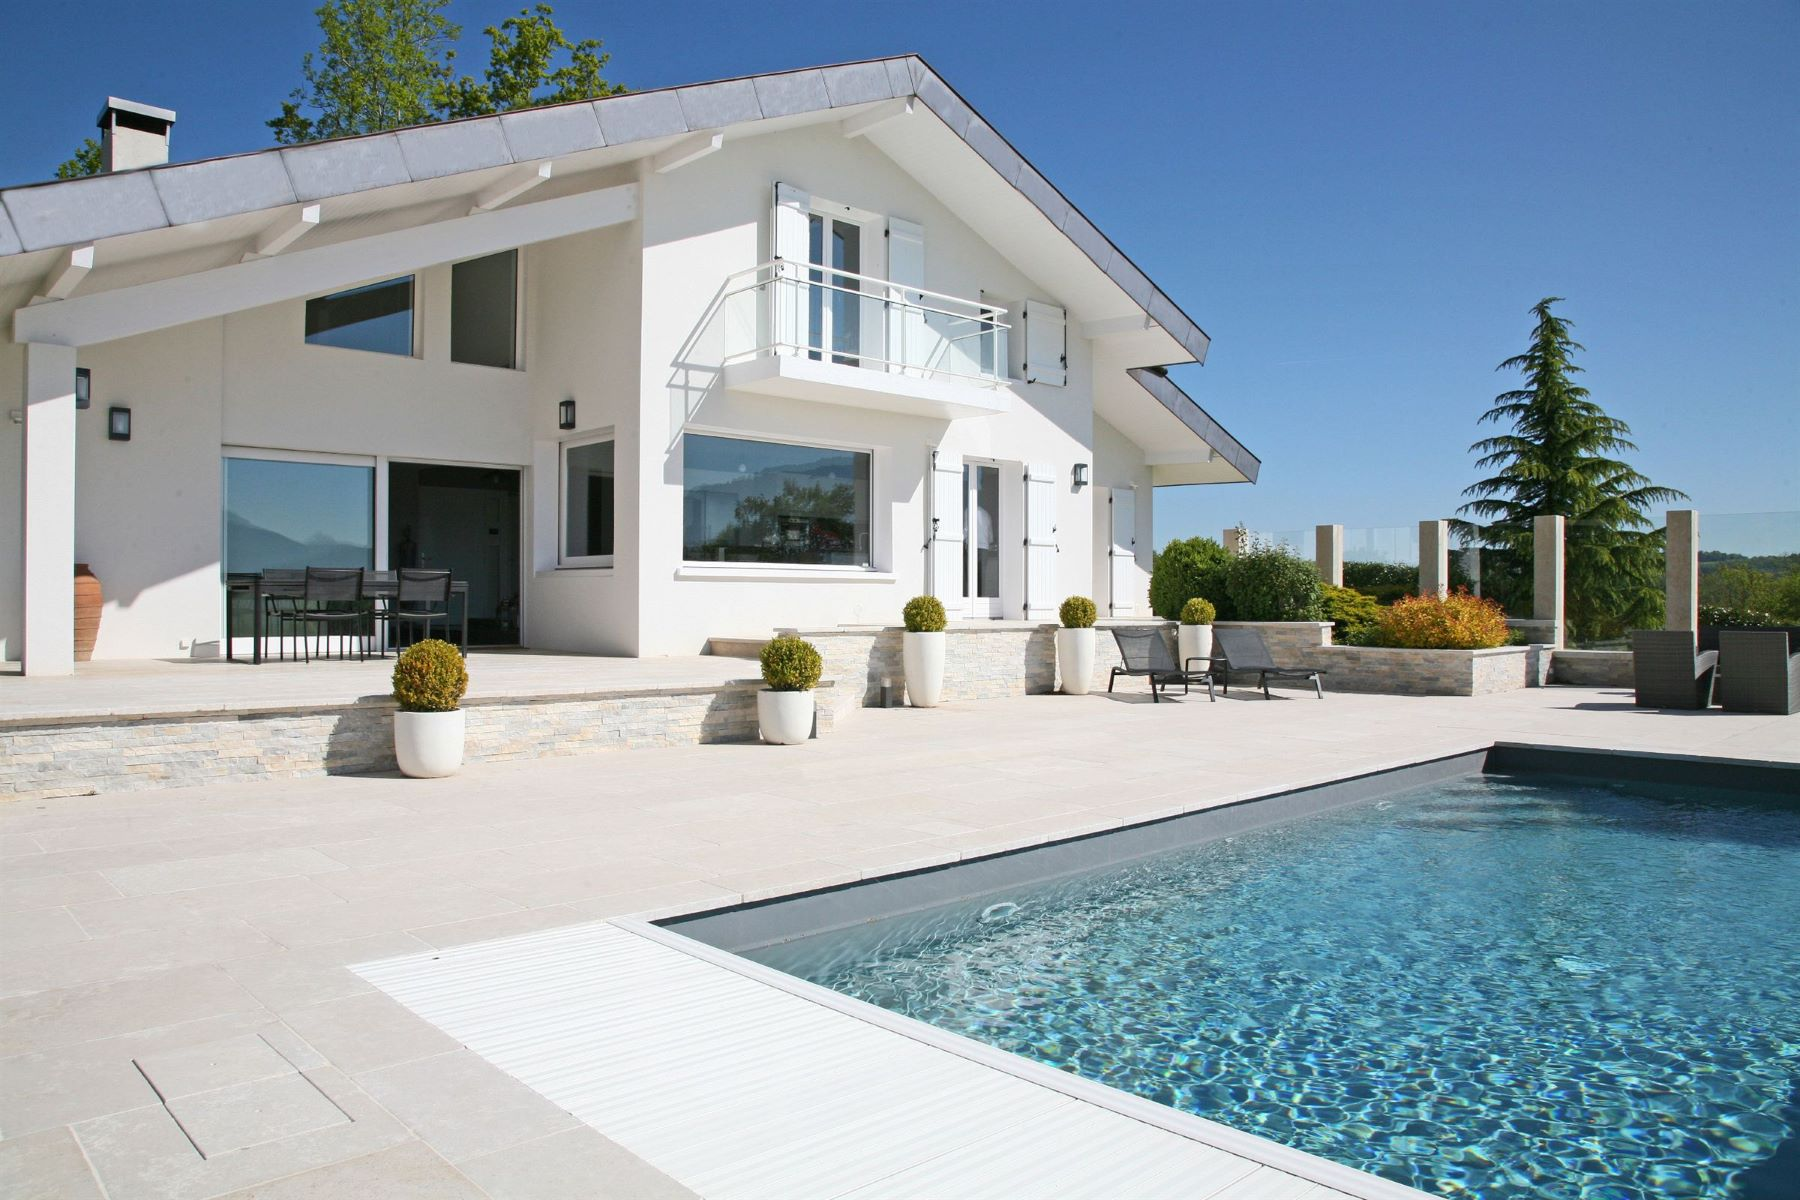 Moradia para Venda às Luxury villa with splendid panorama. Other Rhone-Alpes, Rhone-Alpes, 74370 França